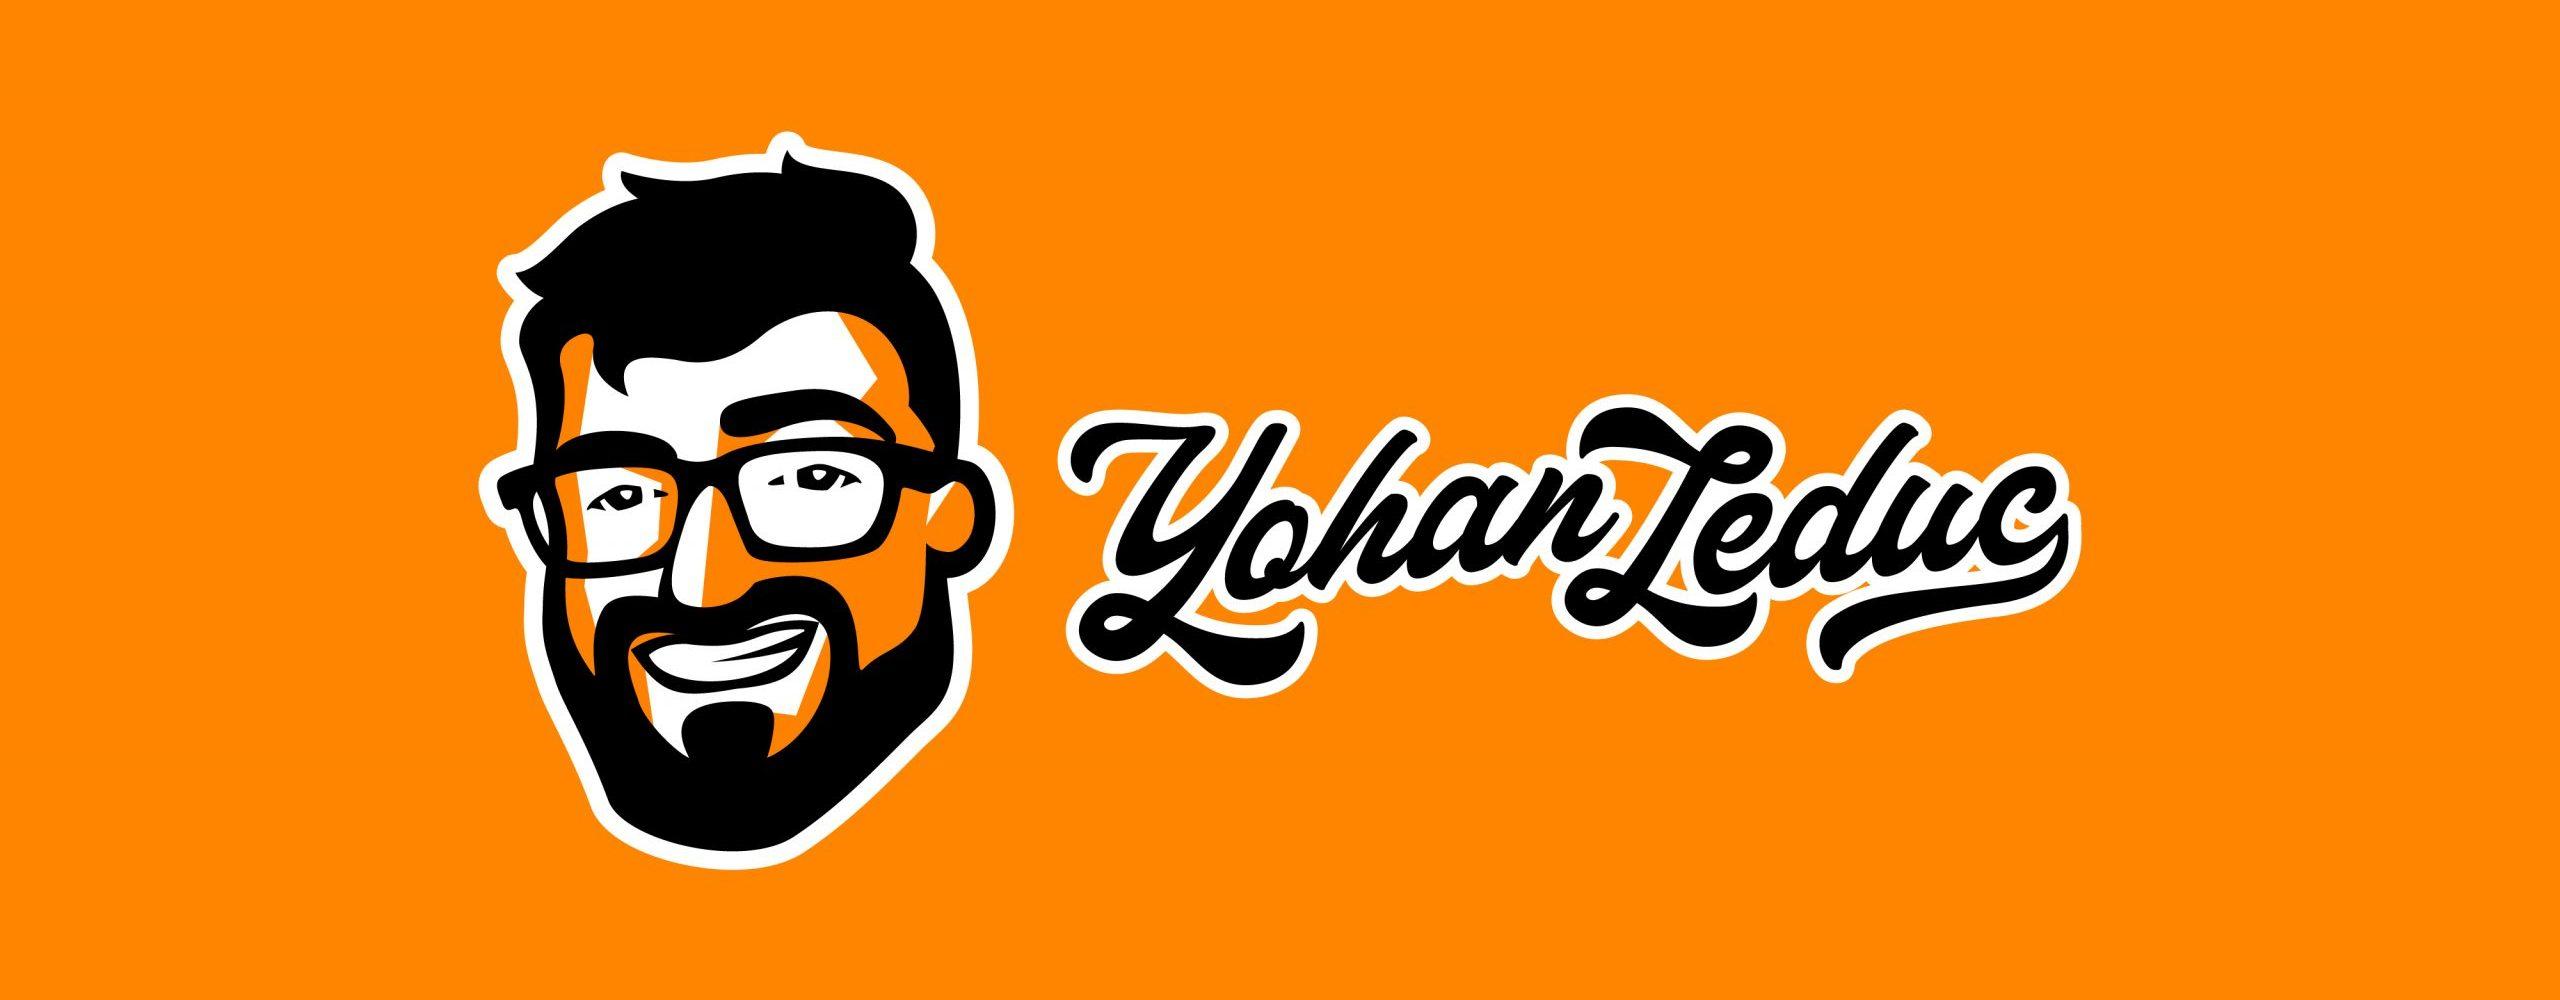 YohanLeduc_Logo_ColorsBG-37